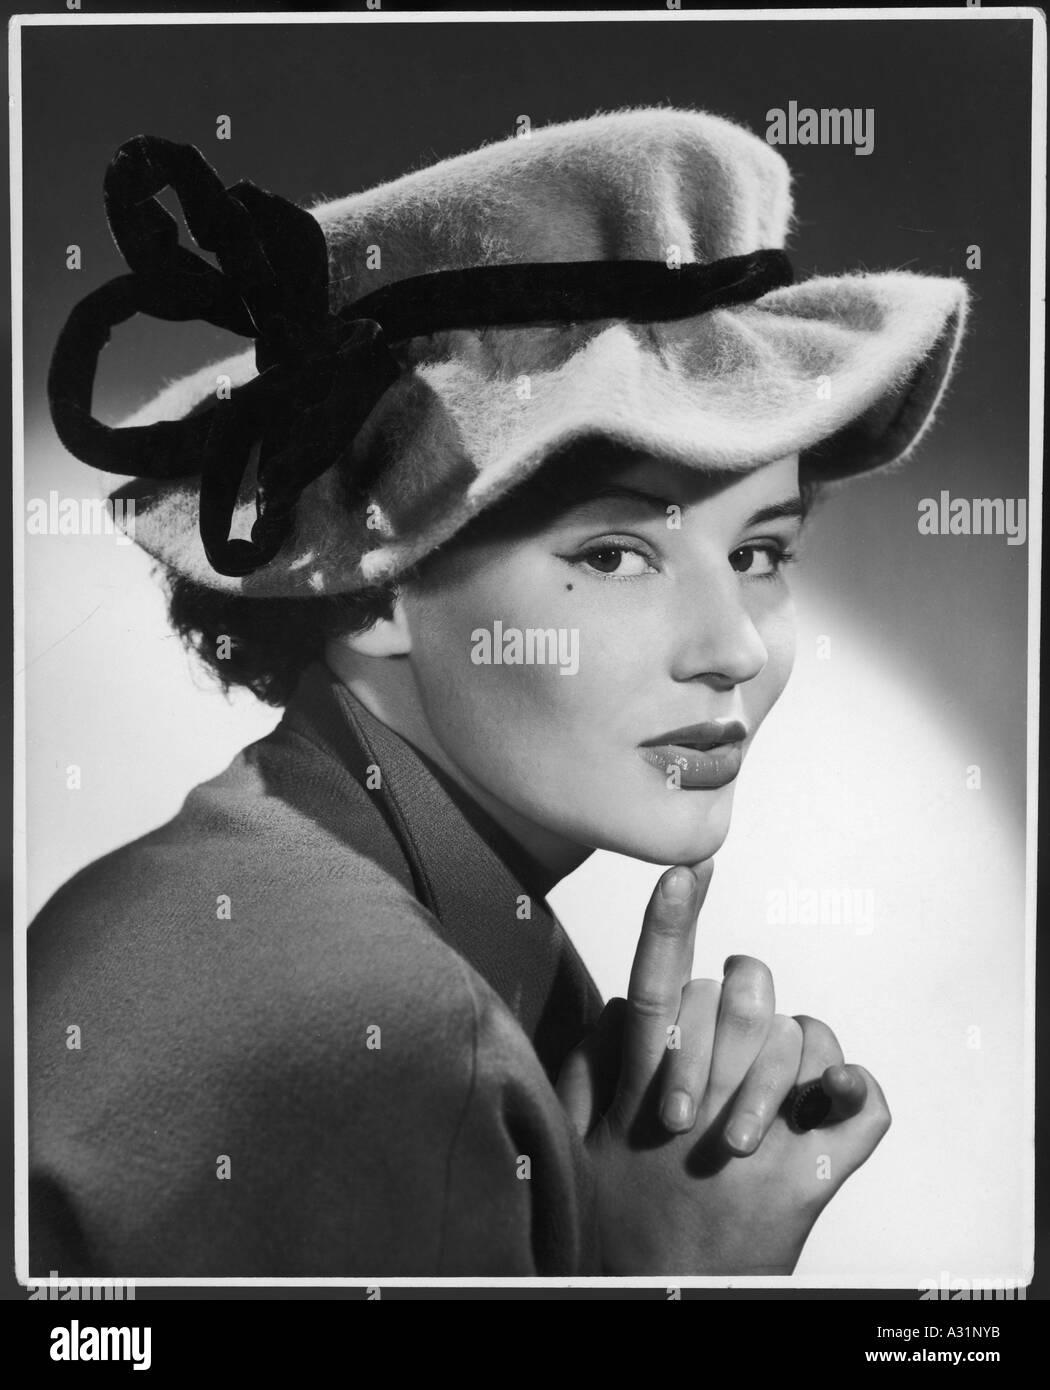 Fashionable 1950s Hat - Stock Image